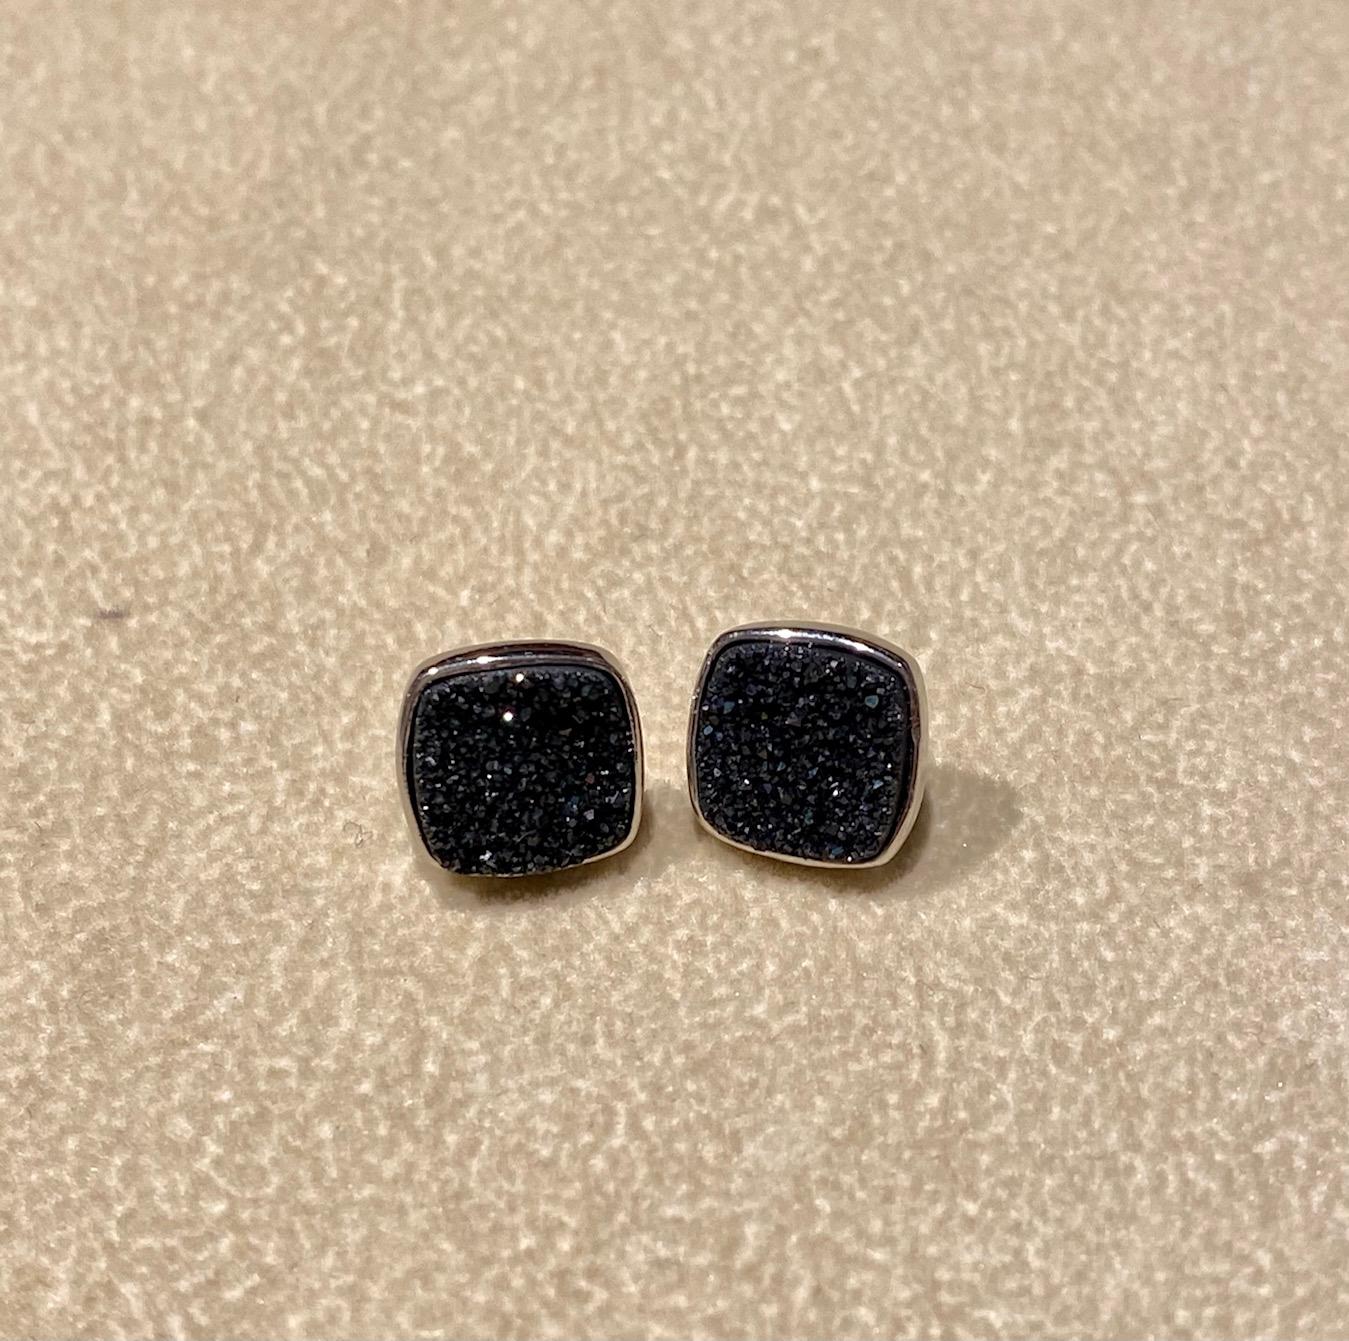 Black Druzy Squares set in Silver Earrings, 10mm